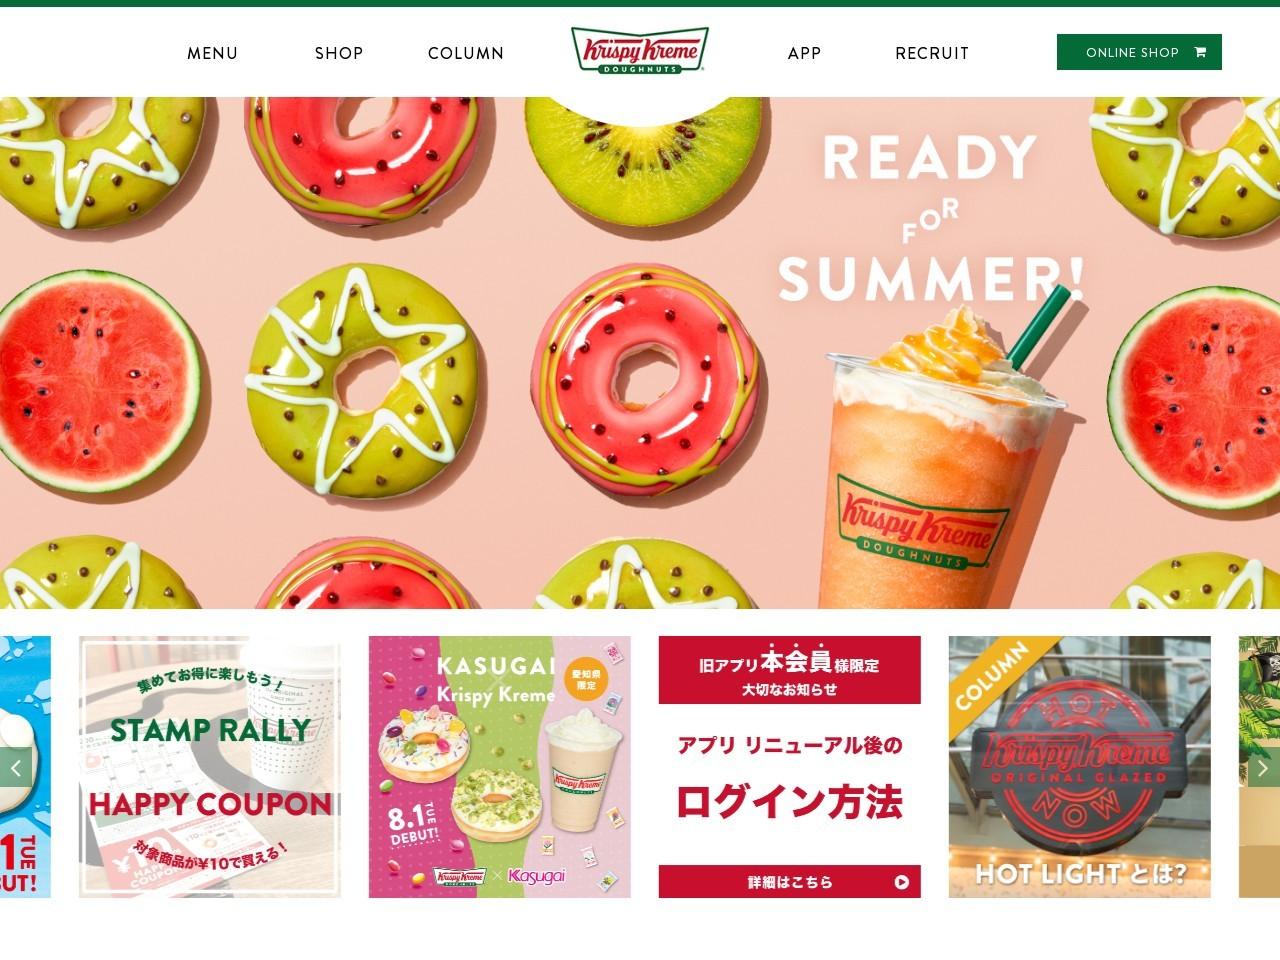 http://krispykreme.jp/menu/doughnut/%20